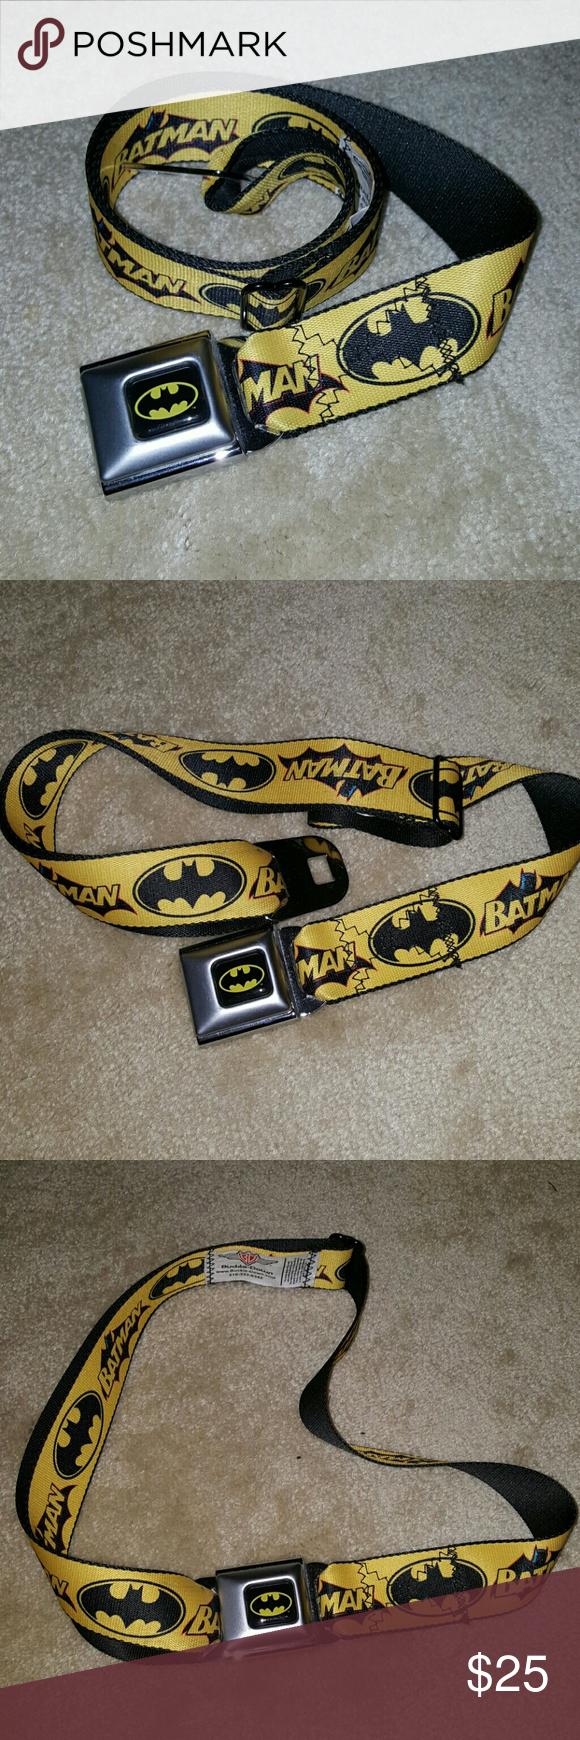 Batman Buckle Belt Batman Buckle belt. Great condition! Unisex. Buckle-Down Accessories Belts